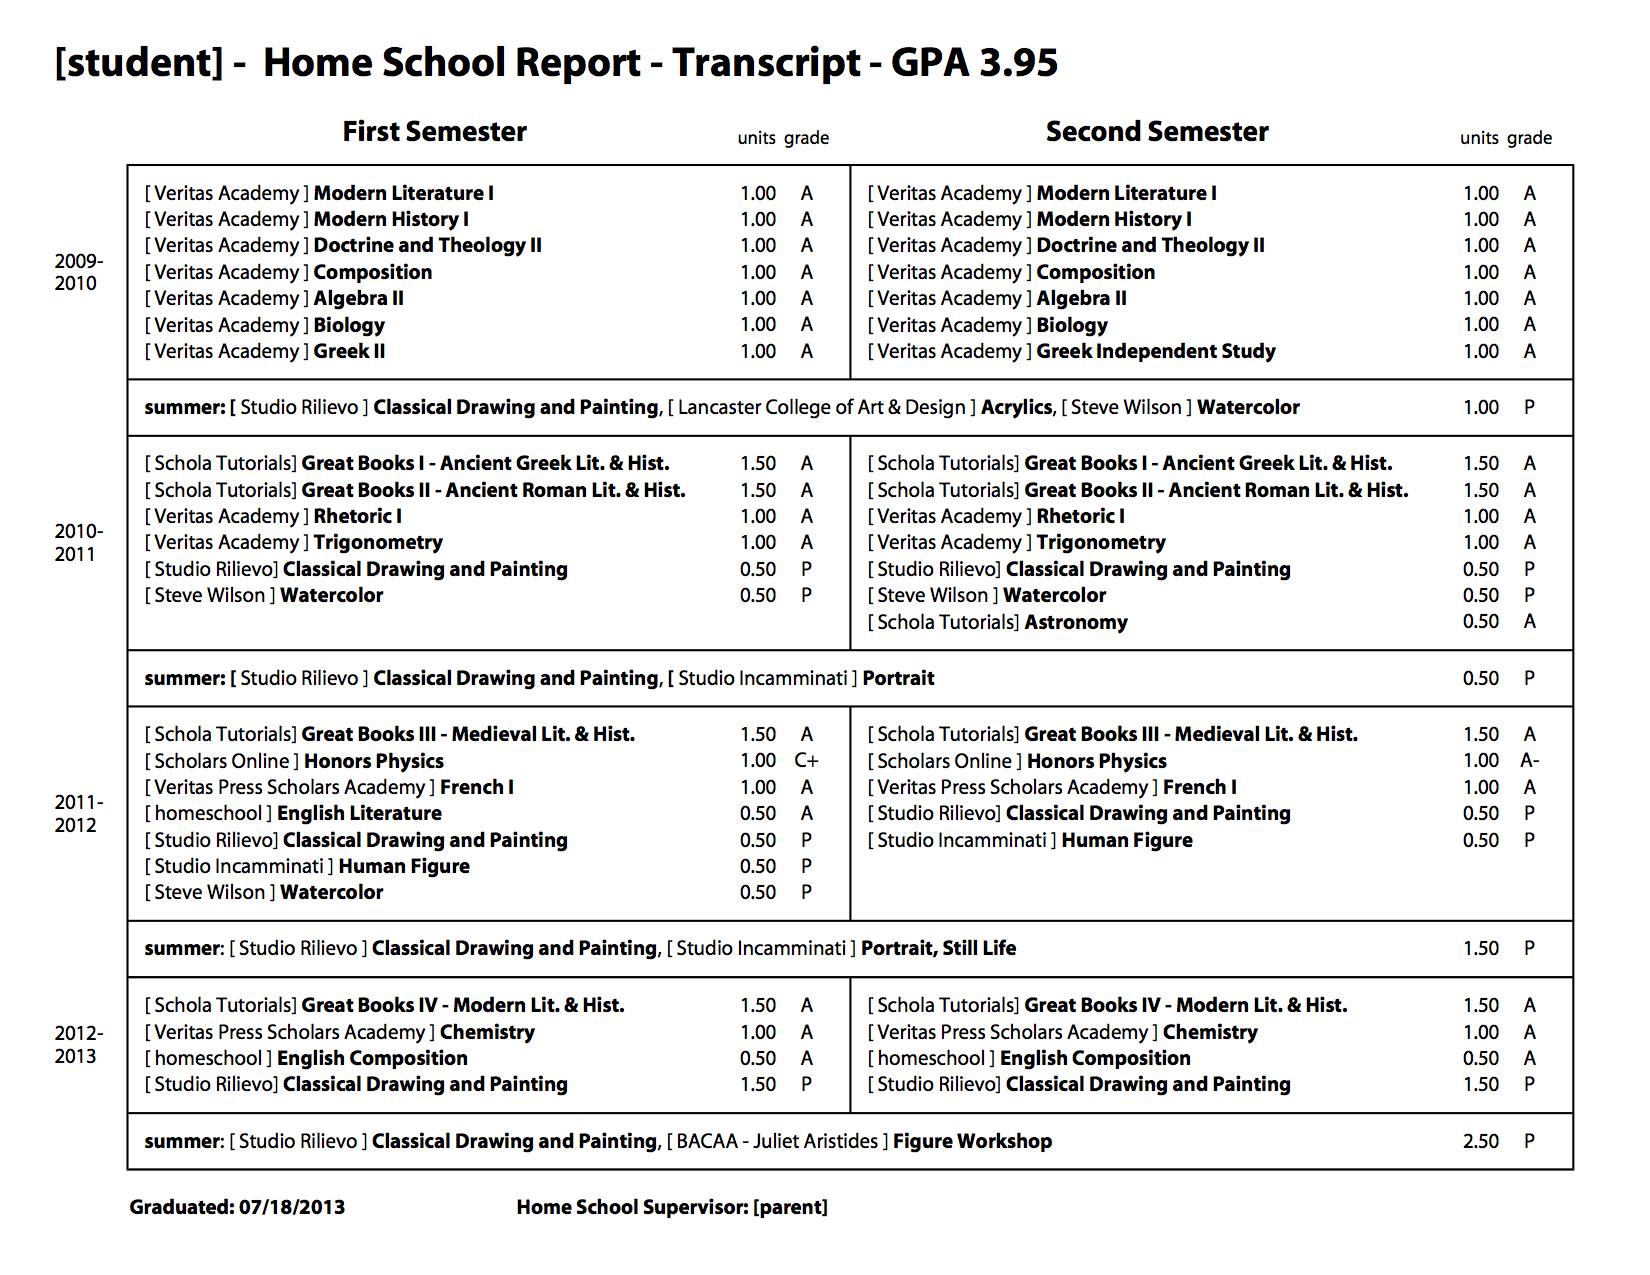 Sample School Report And Transcript For Homeschoolers Article